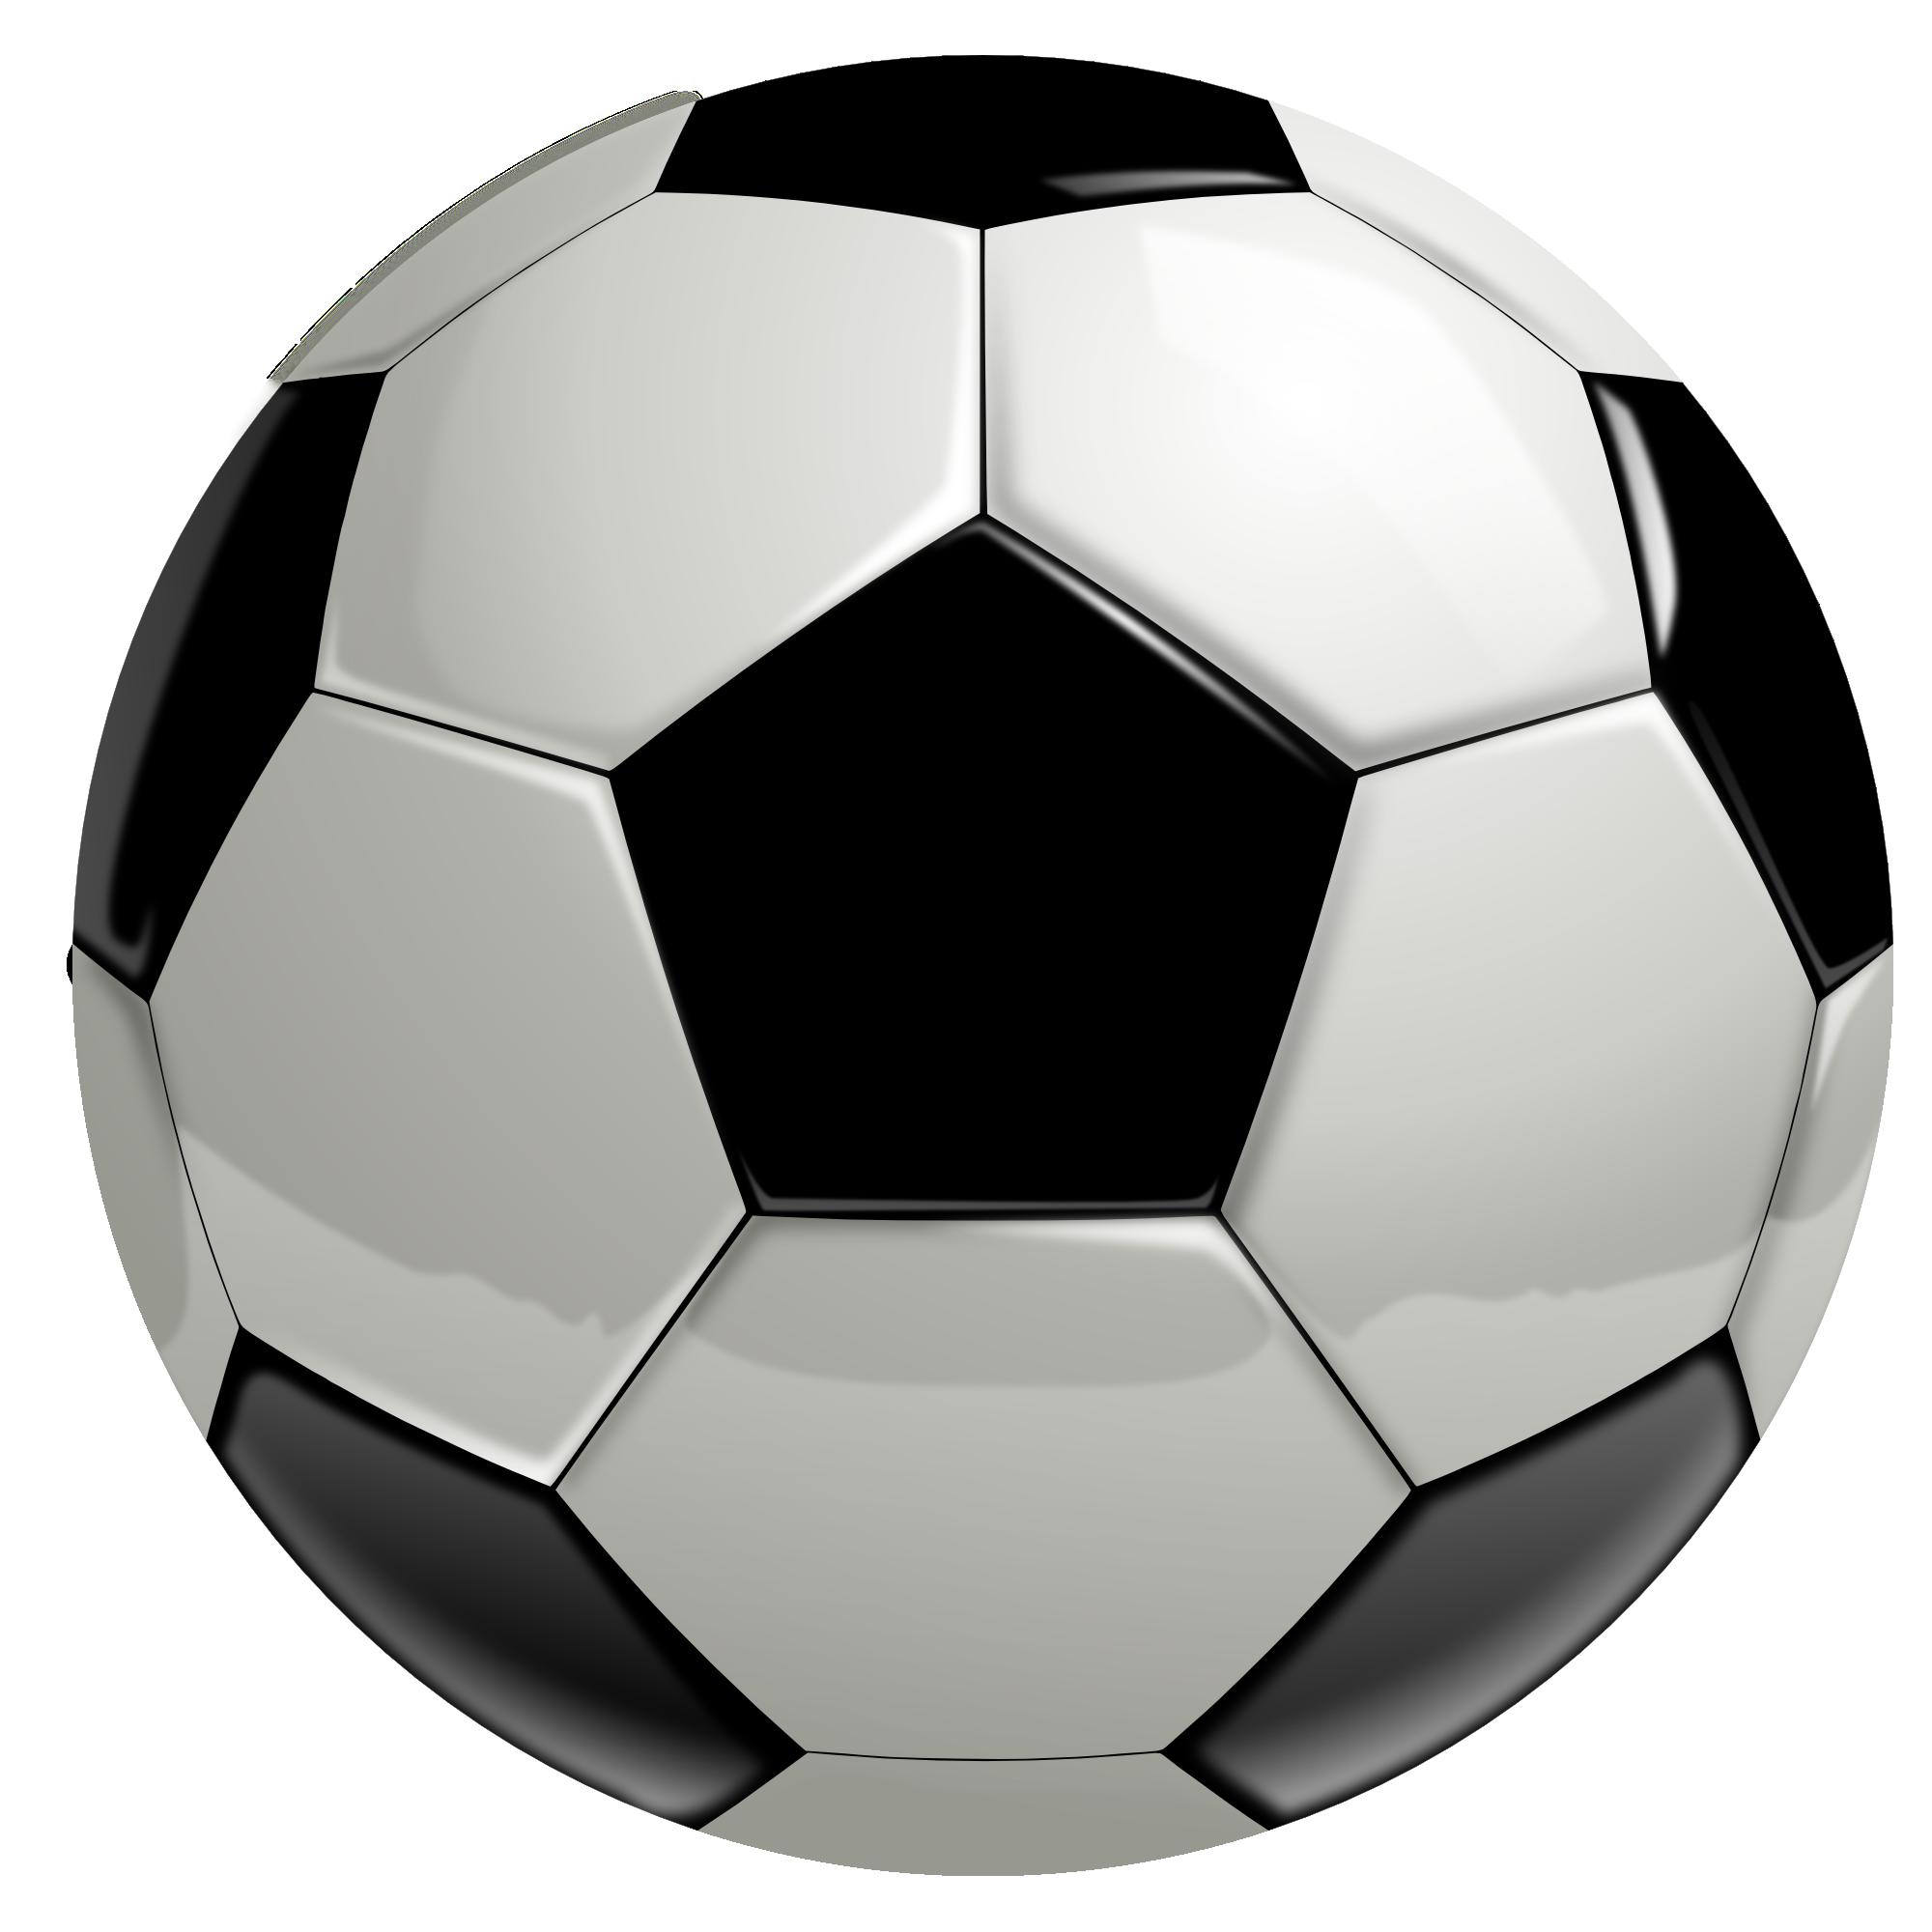 Football Png Transparent Image - Football, Transparent background PNG HD thumbnail